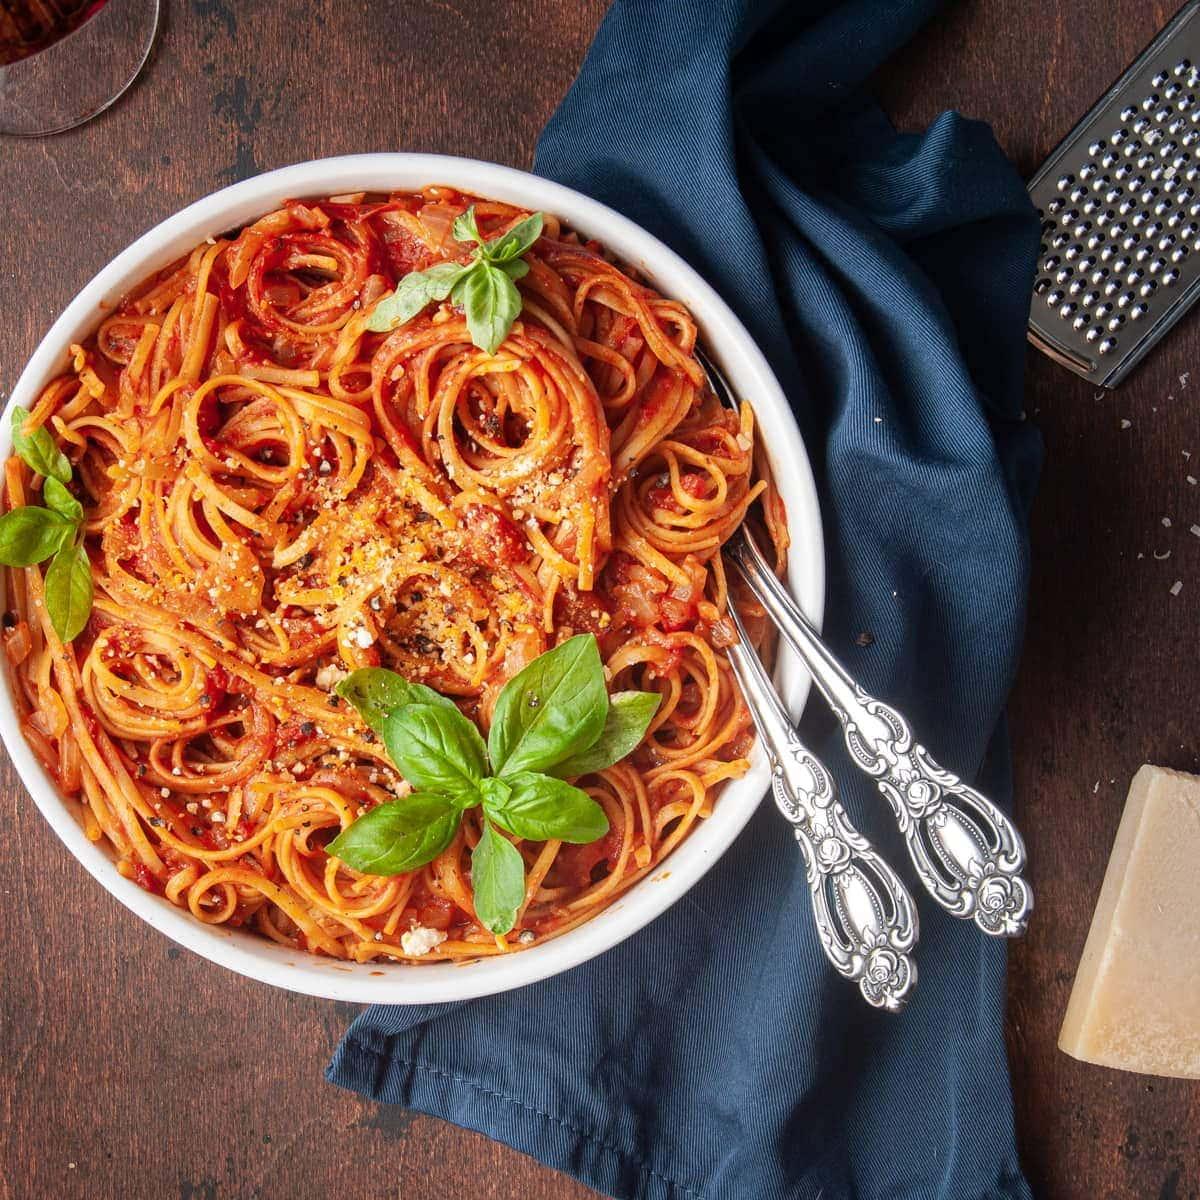 one-pot vegan pasta with tomato sauce next to parmesan cheese